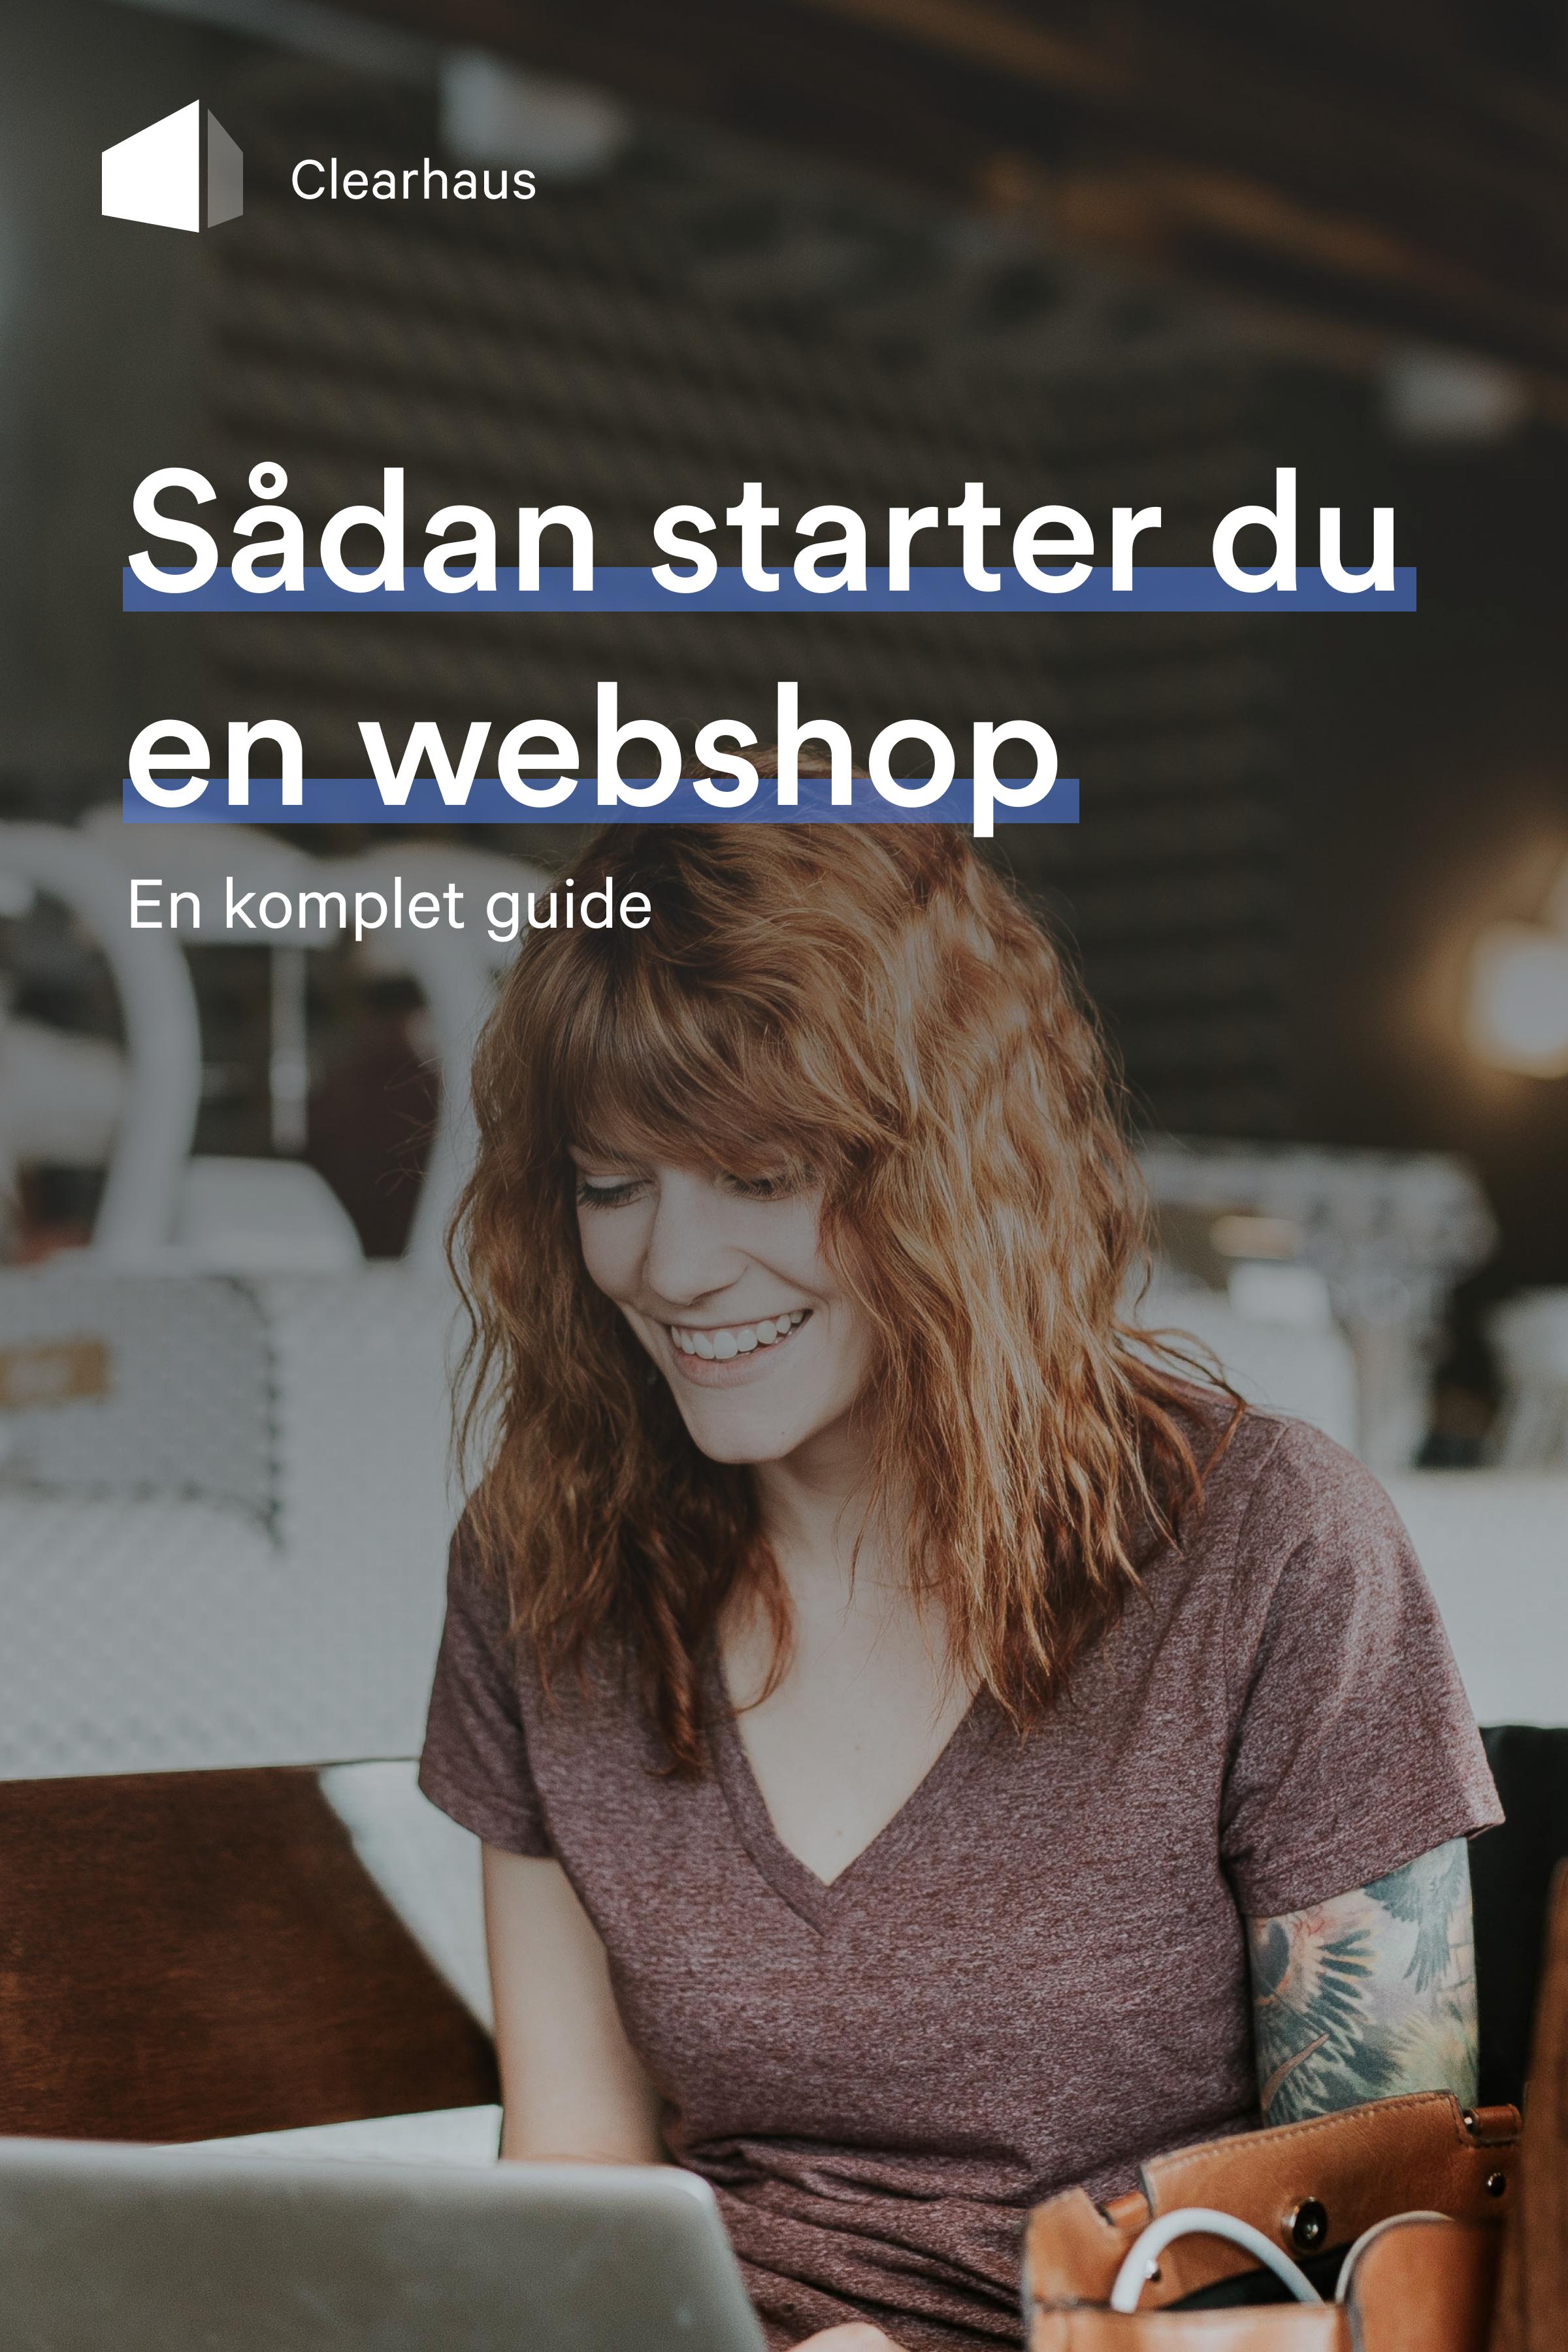 Saadan_starter_du_en_webshop-front_page